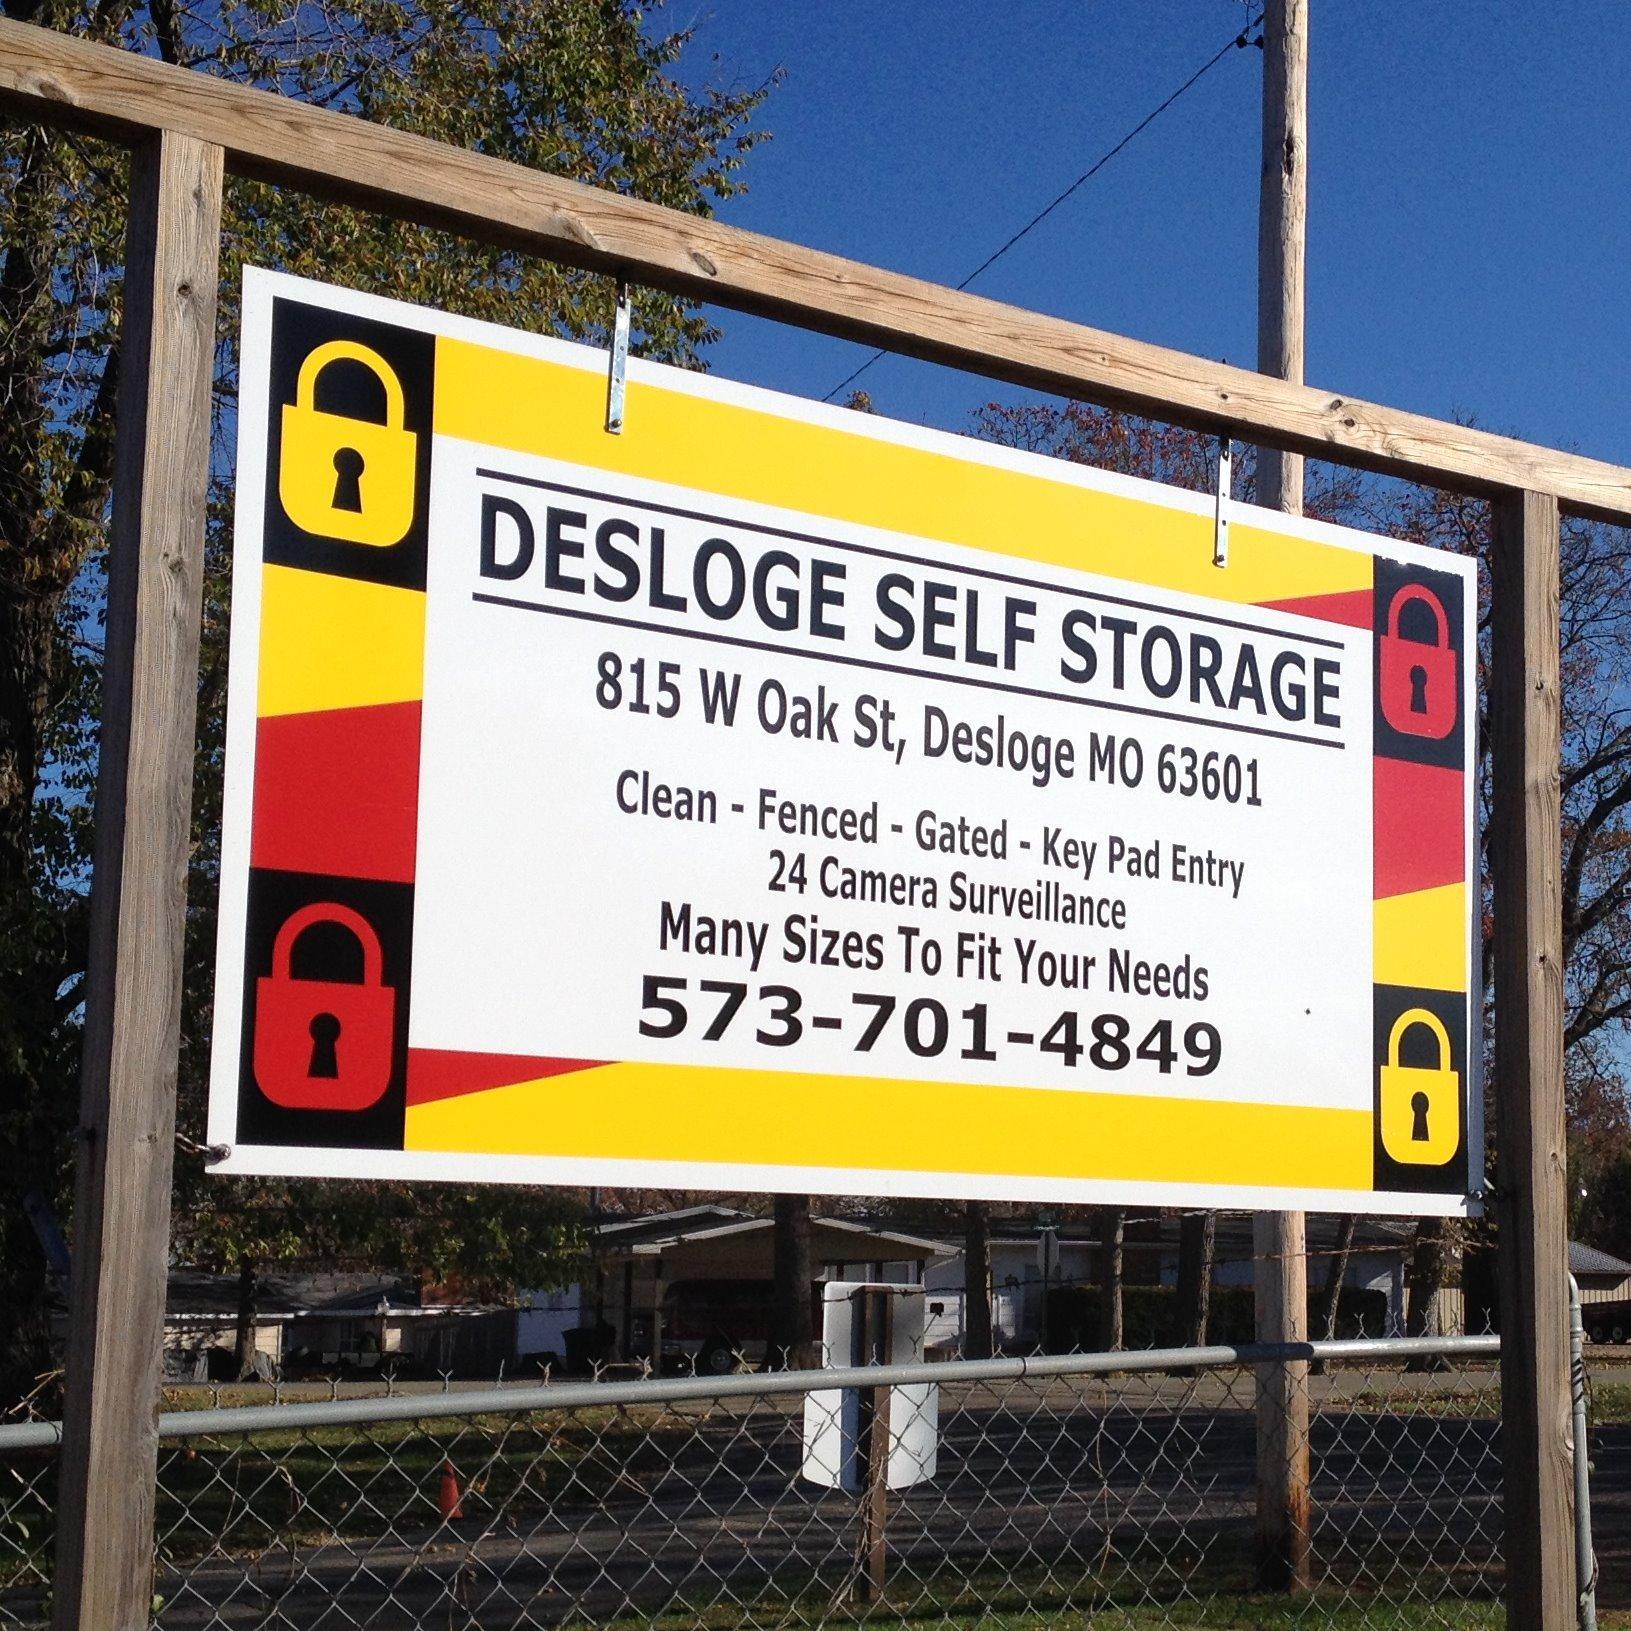 Desloge Self Storage